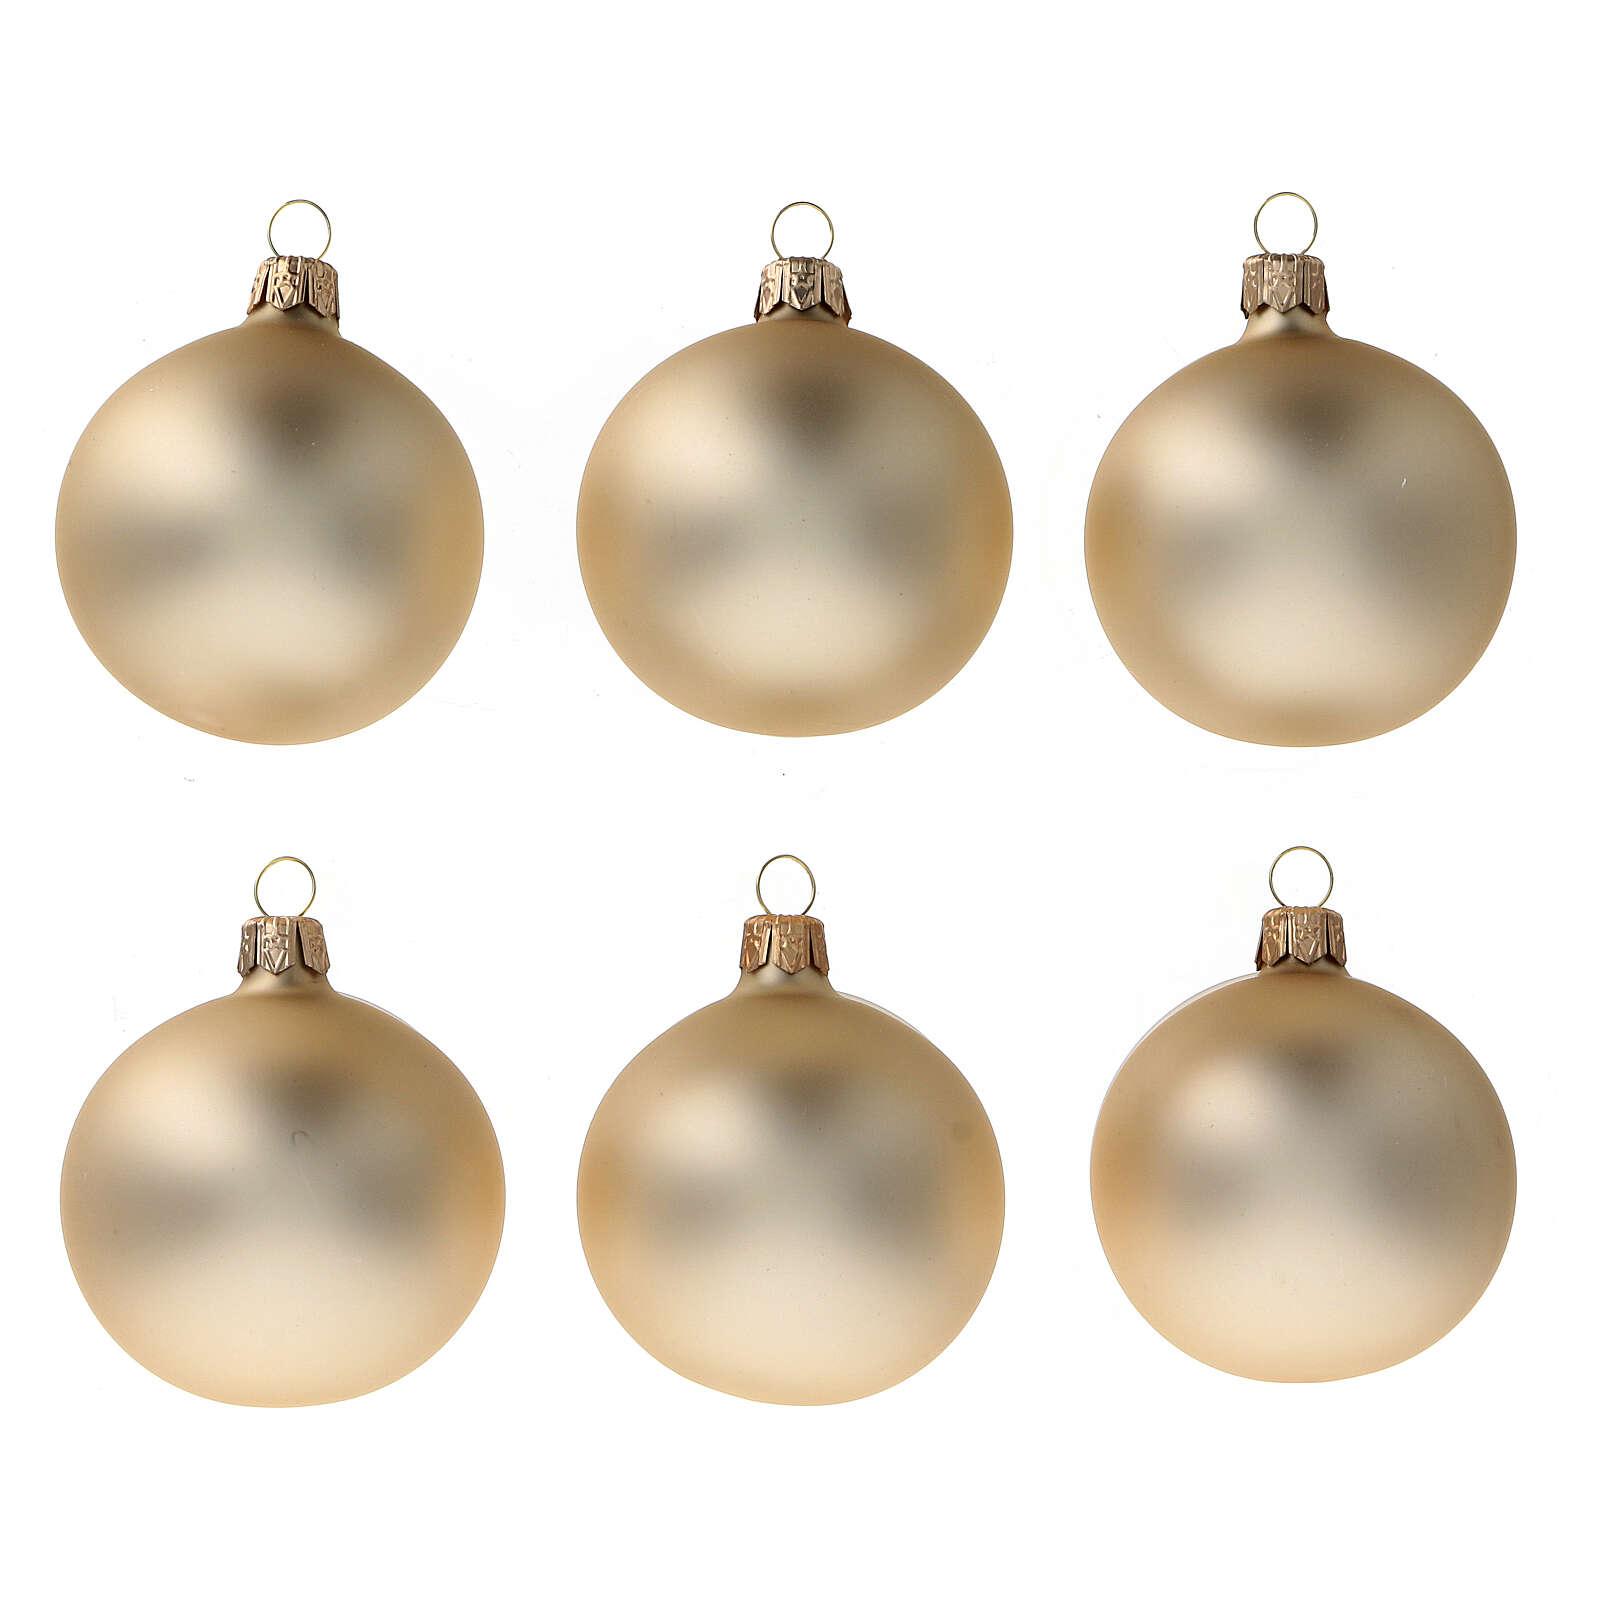 Pallina albero Natale oro pallido opaco 60 mm vetro soffiato 6 pz 4